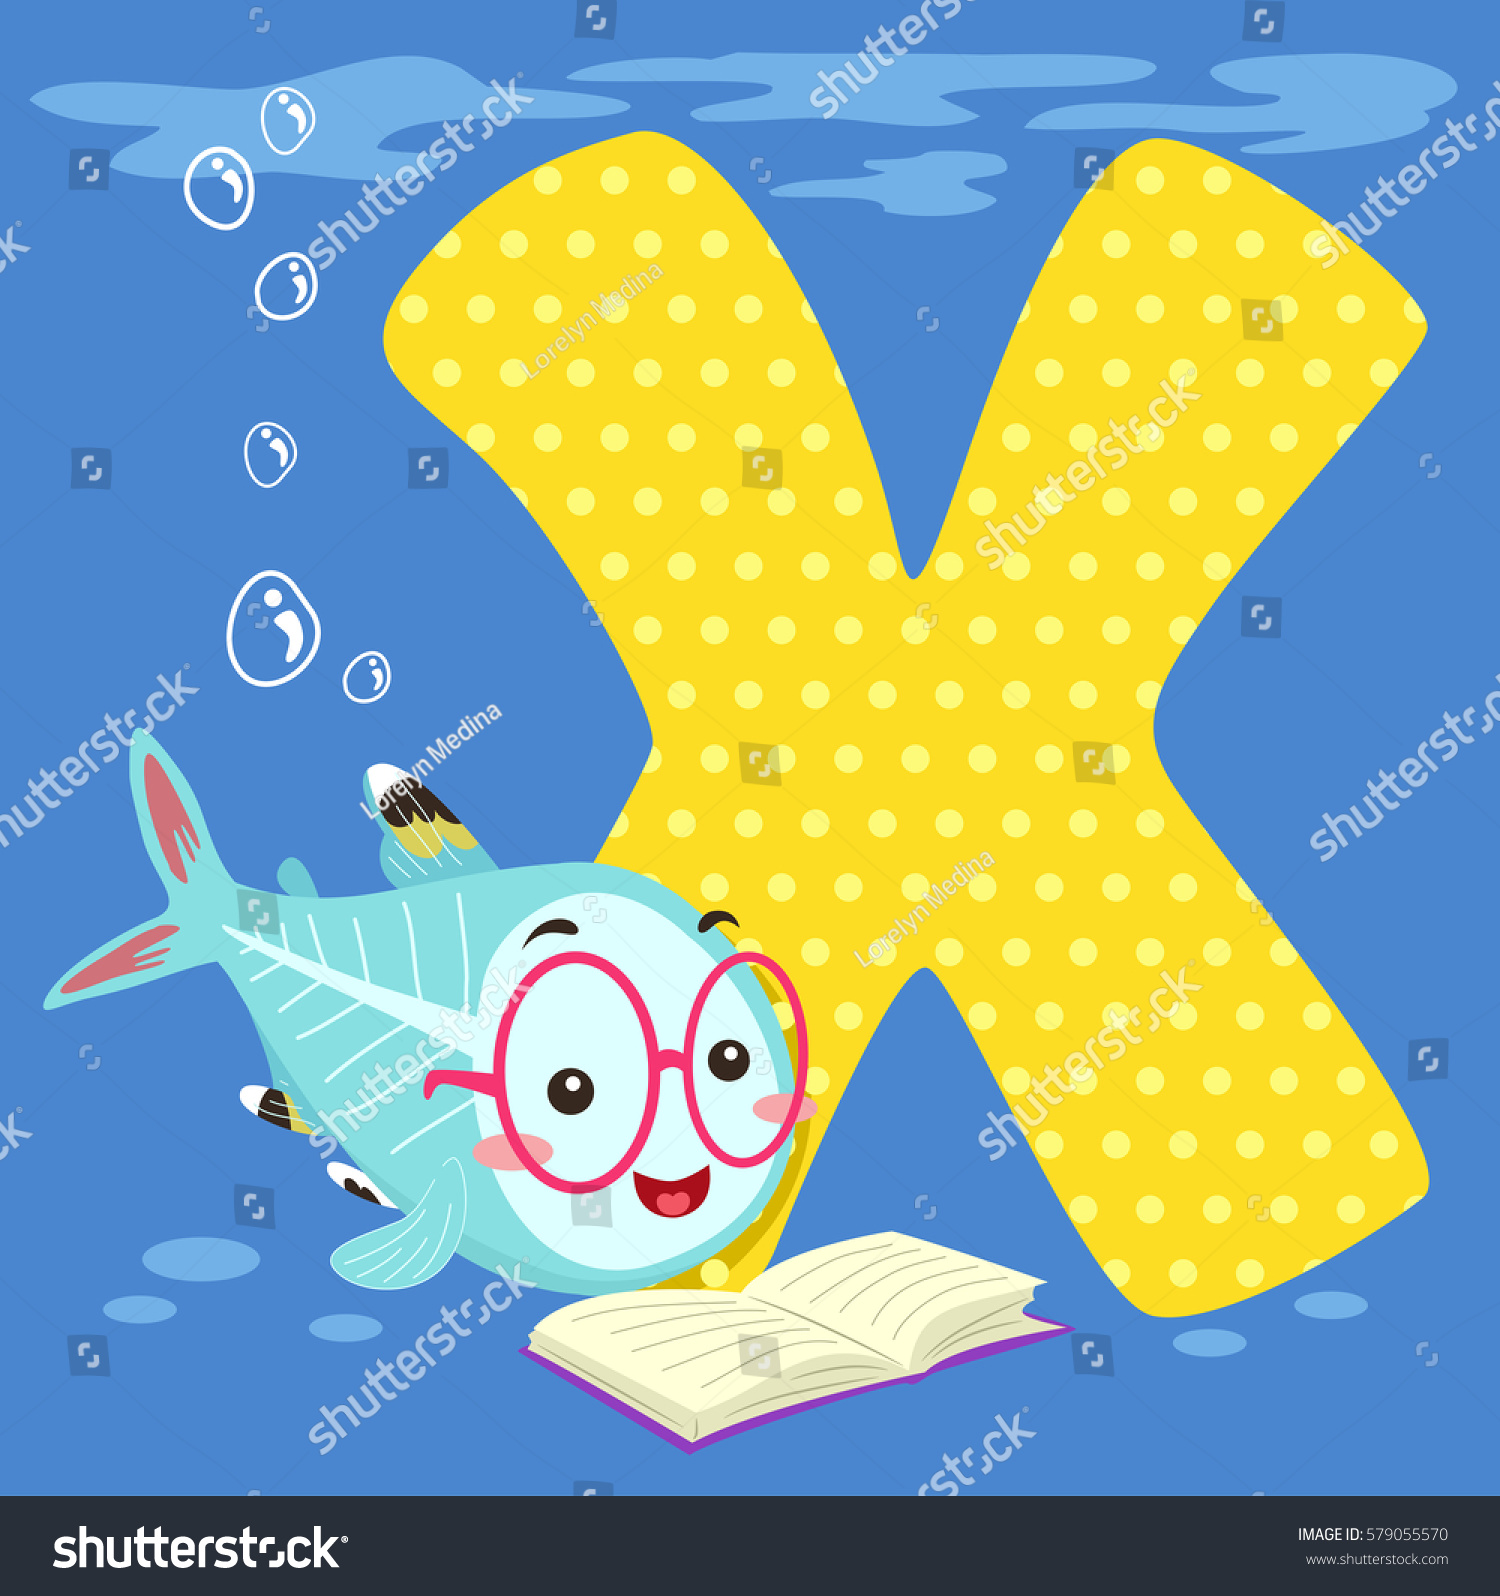 Alphabet Illustration Featuring Xray Fish Reading Stock